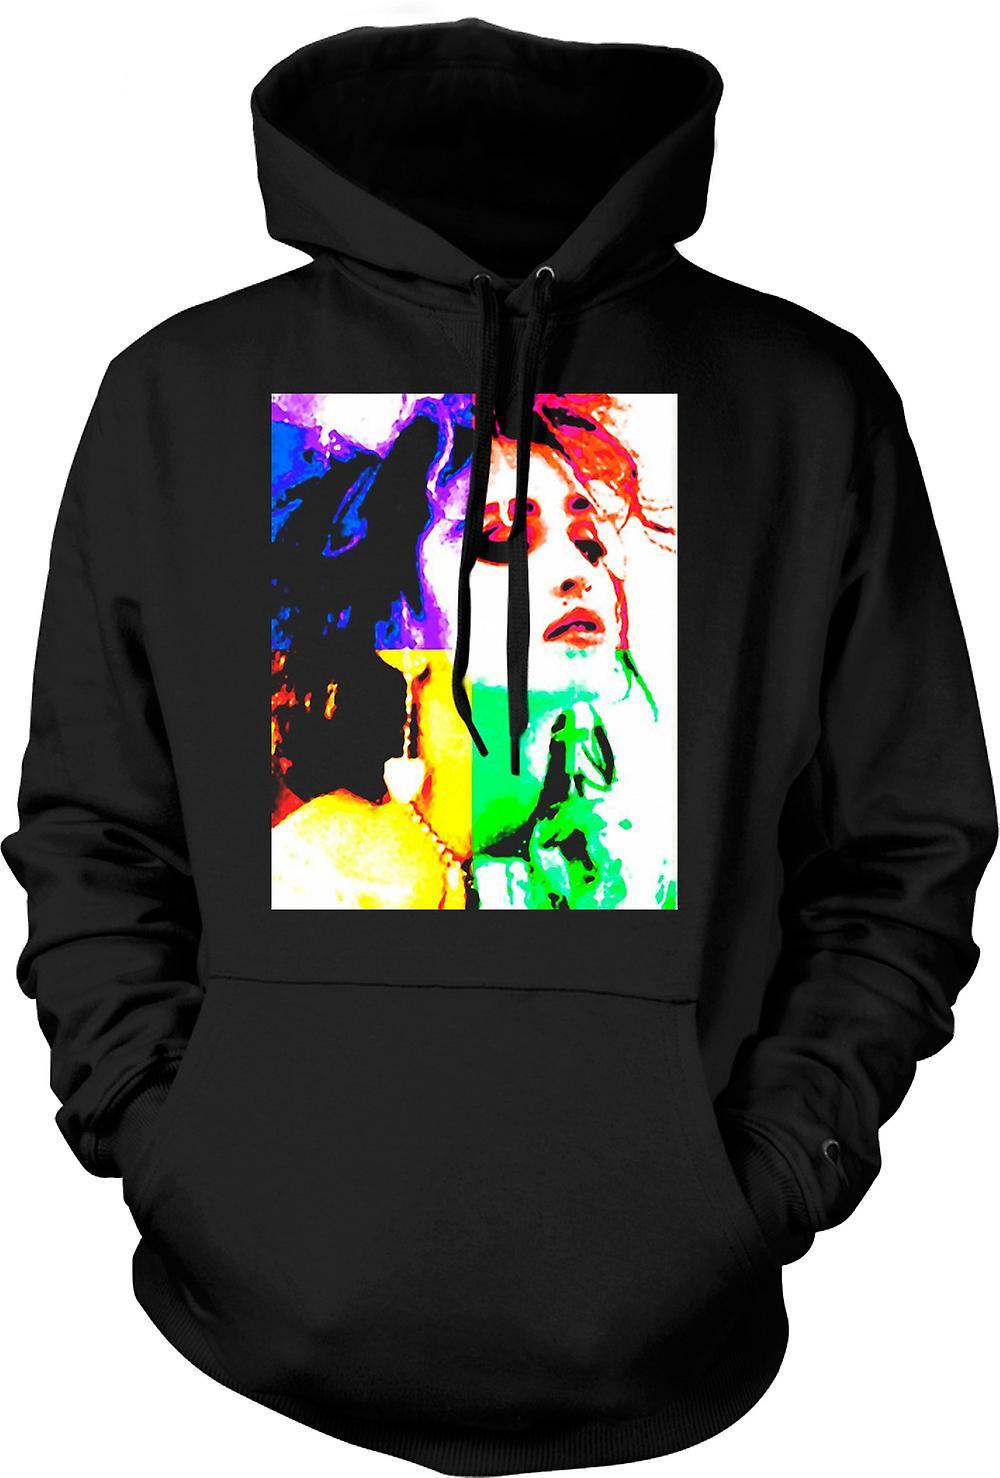 Mens Hoodie - Madonna - Pop Art